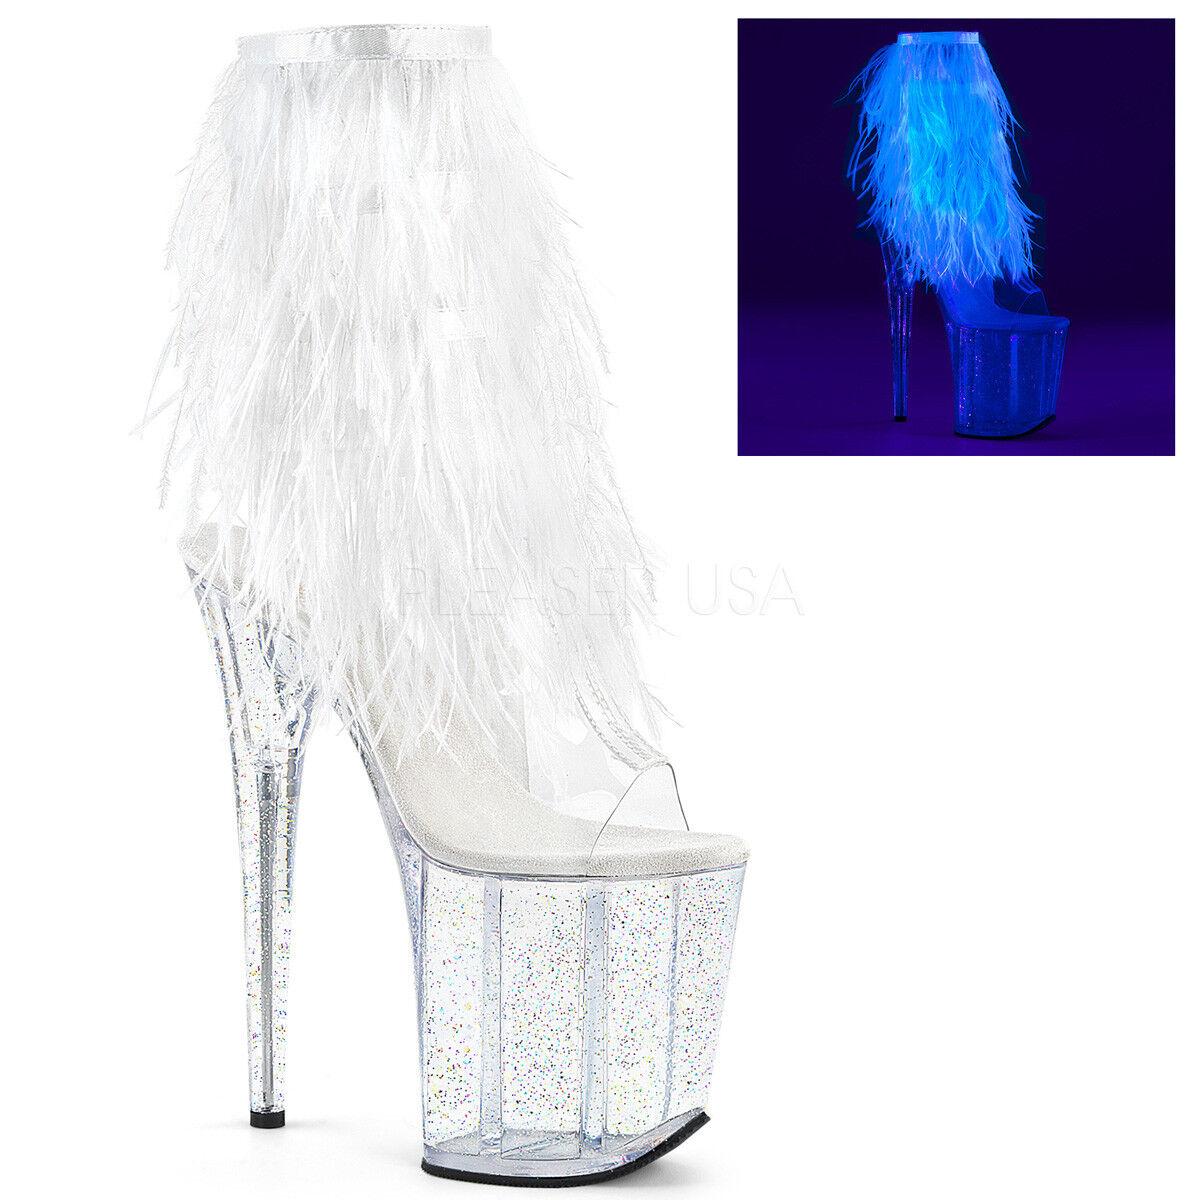 8  bianca Feathers Fringe Glow Glow Glow in the Dark Dancer Stripper Heels stivali Dimensione 10 11 68b7ac